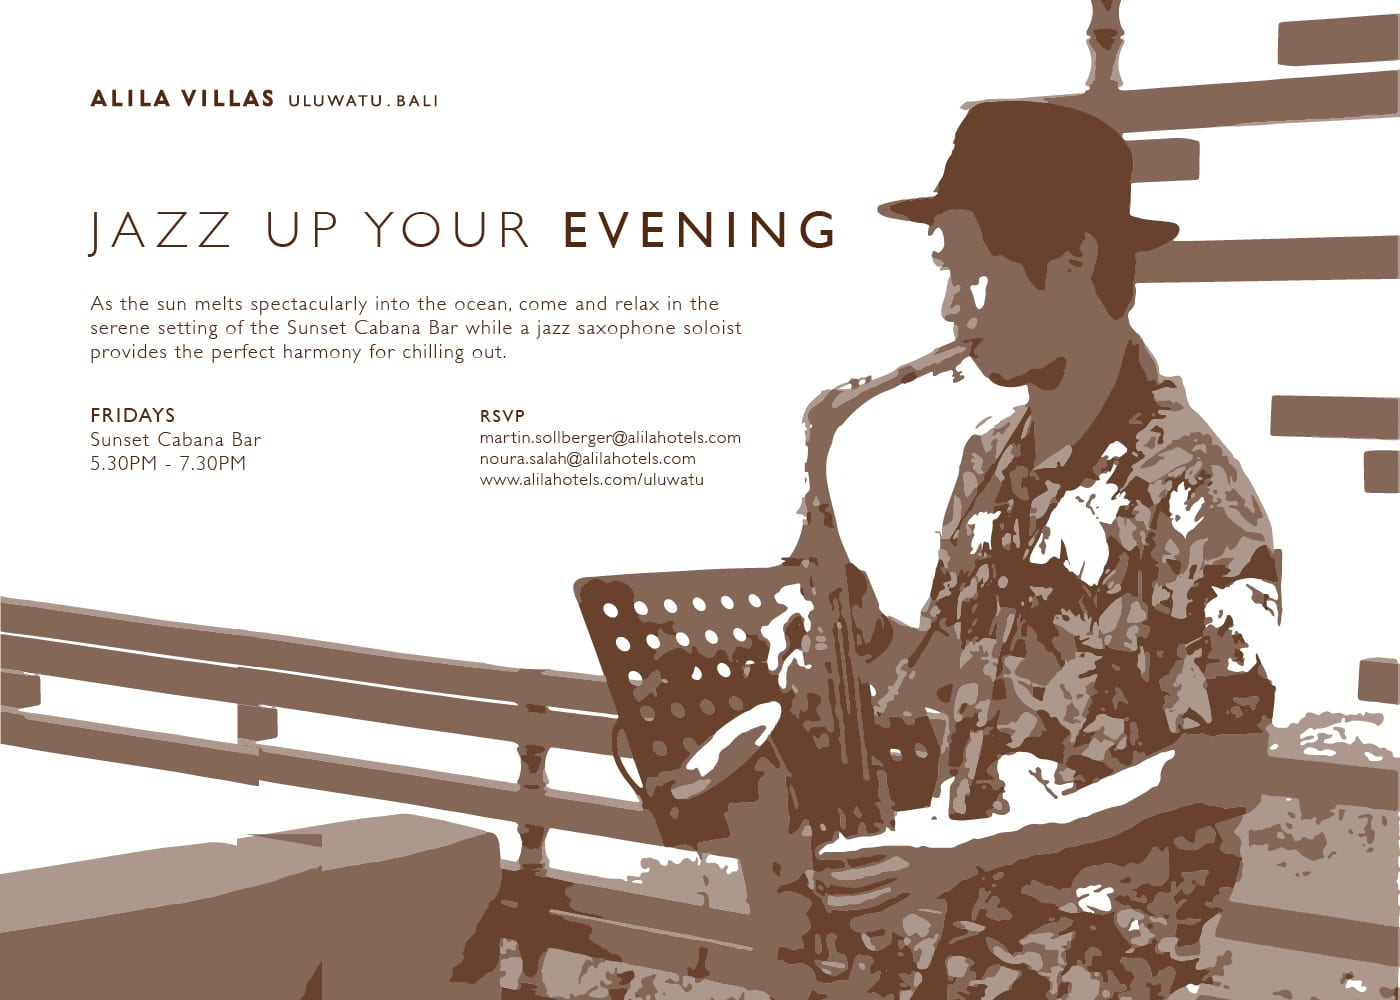 Alila Villas Uluwatu : Jazz Up Your Evening